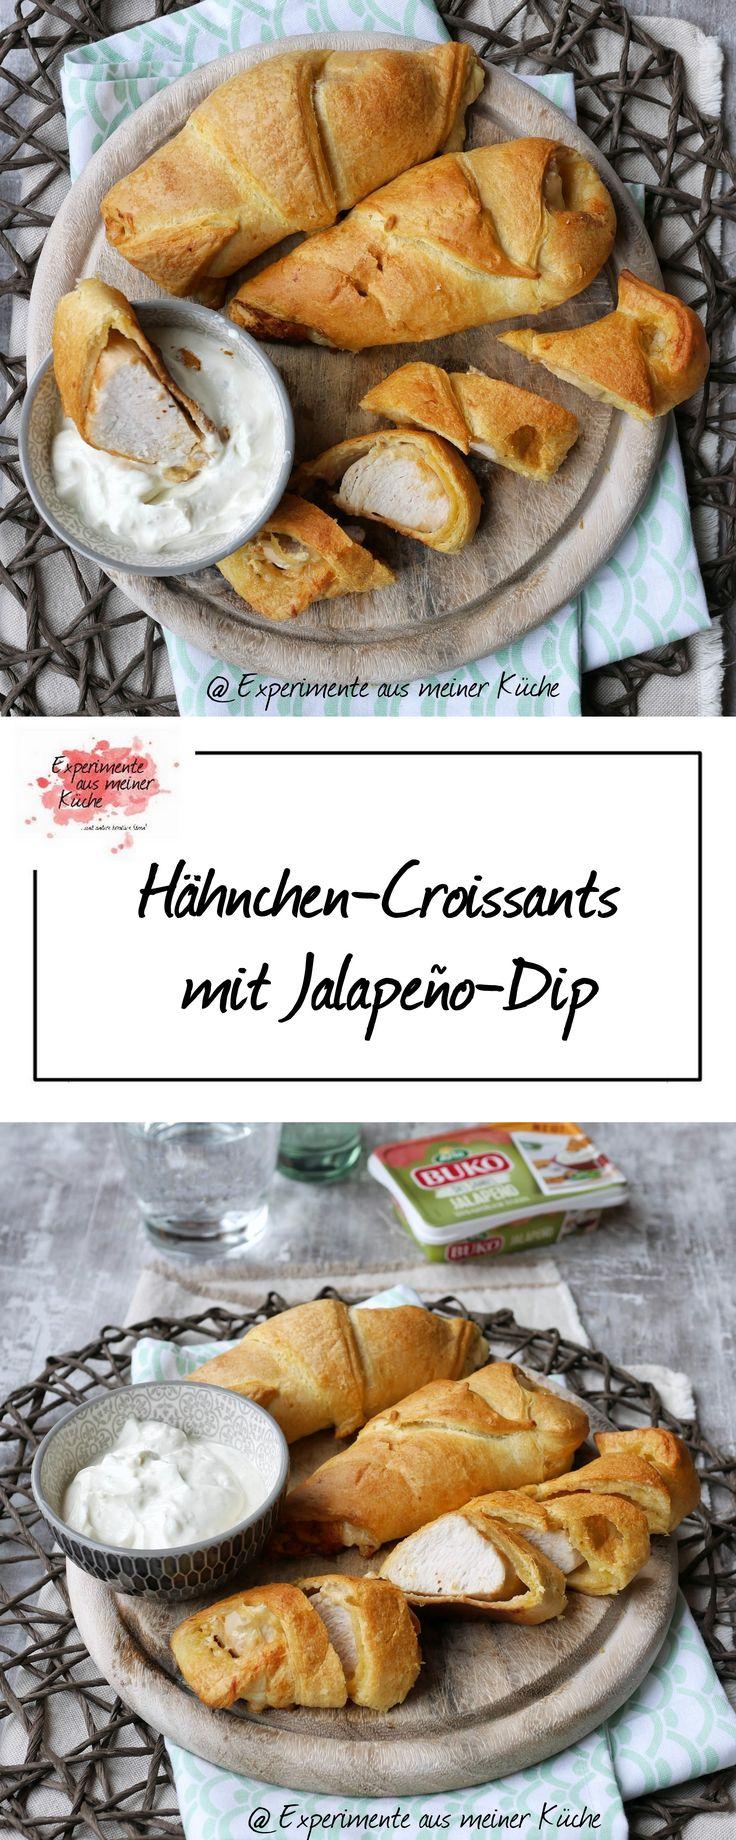 Hähnchen-Croissants mit Jalapeño-Dip | Rezept | Fingerfood | Kochen | Partyfood